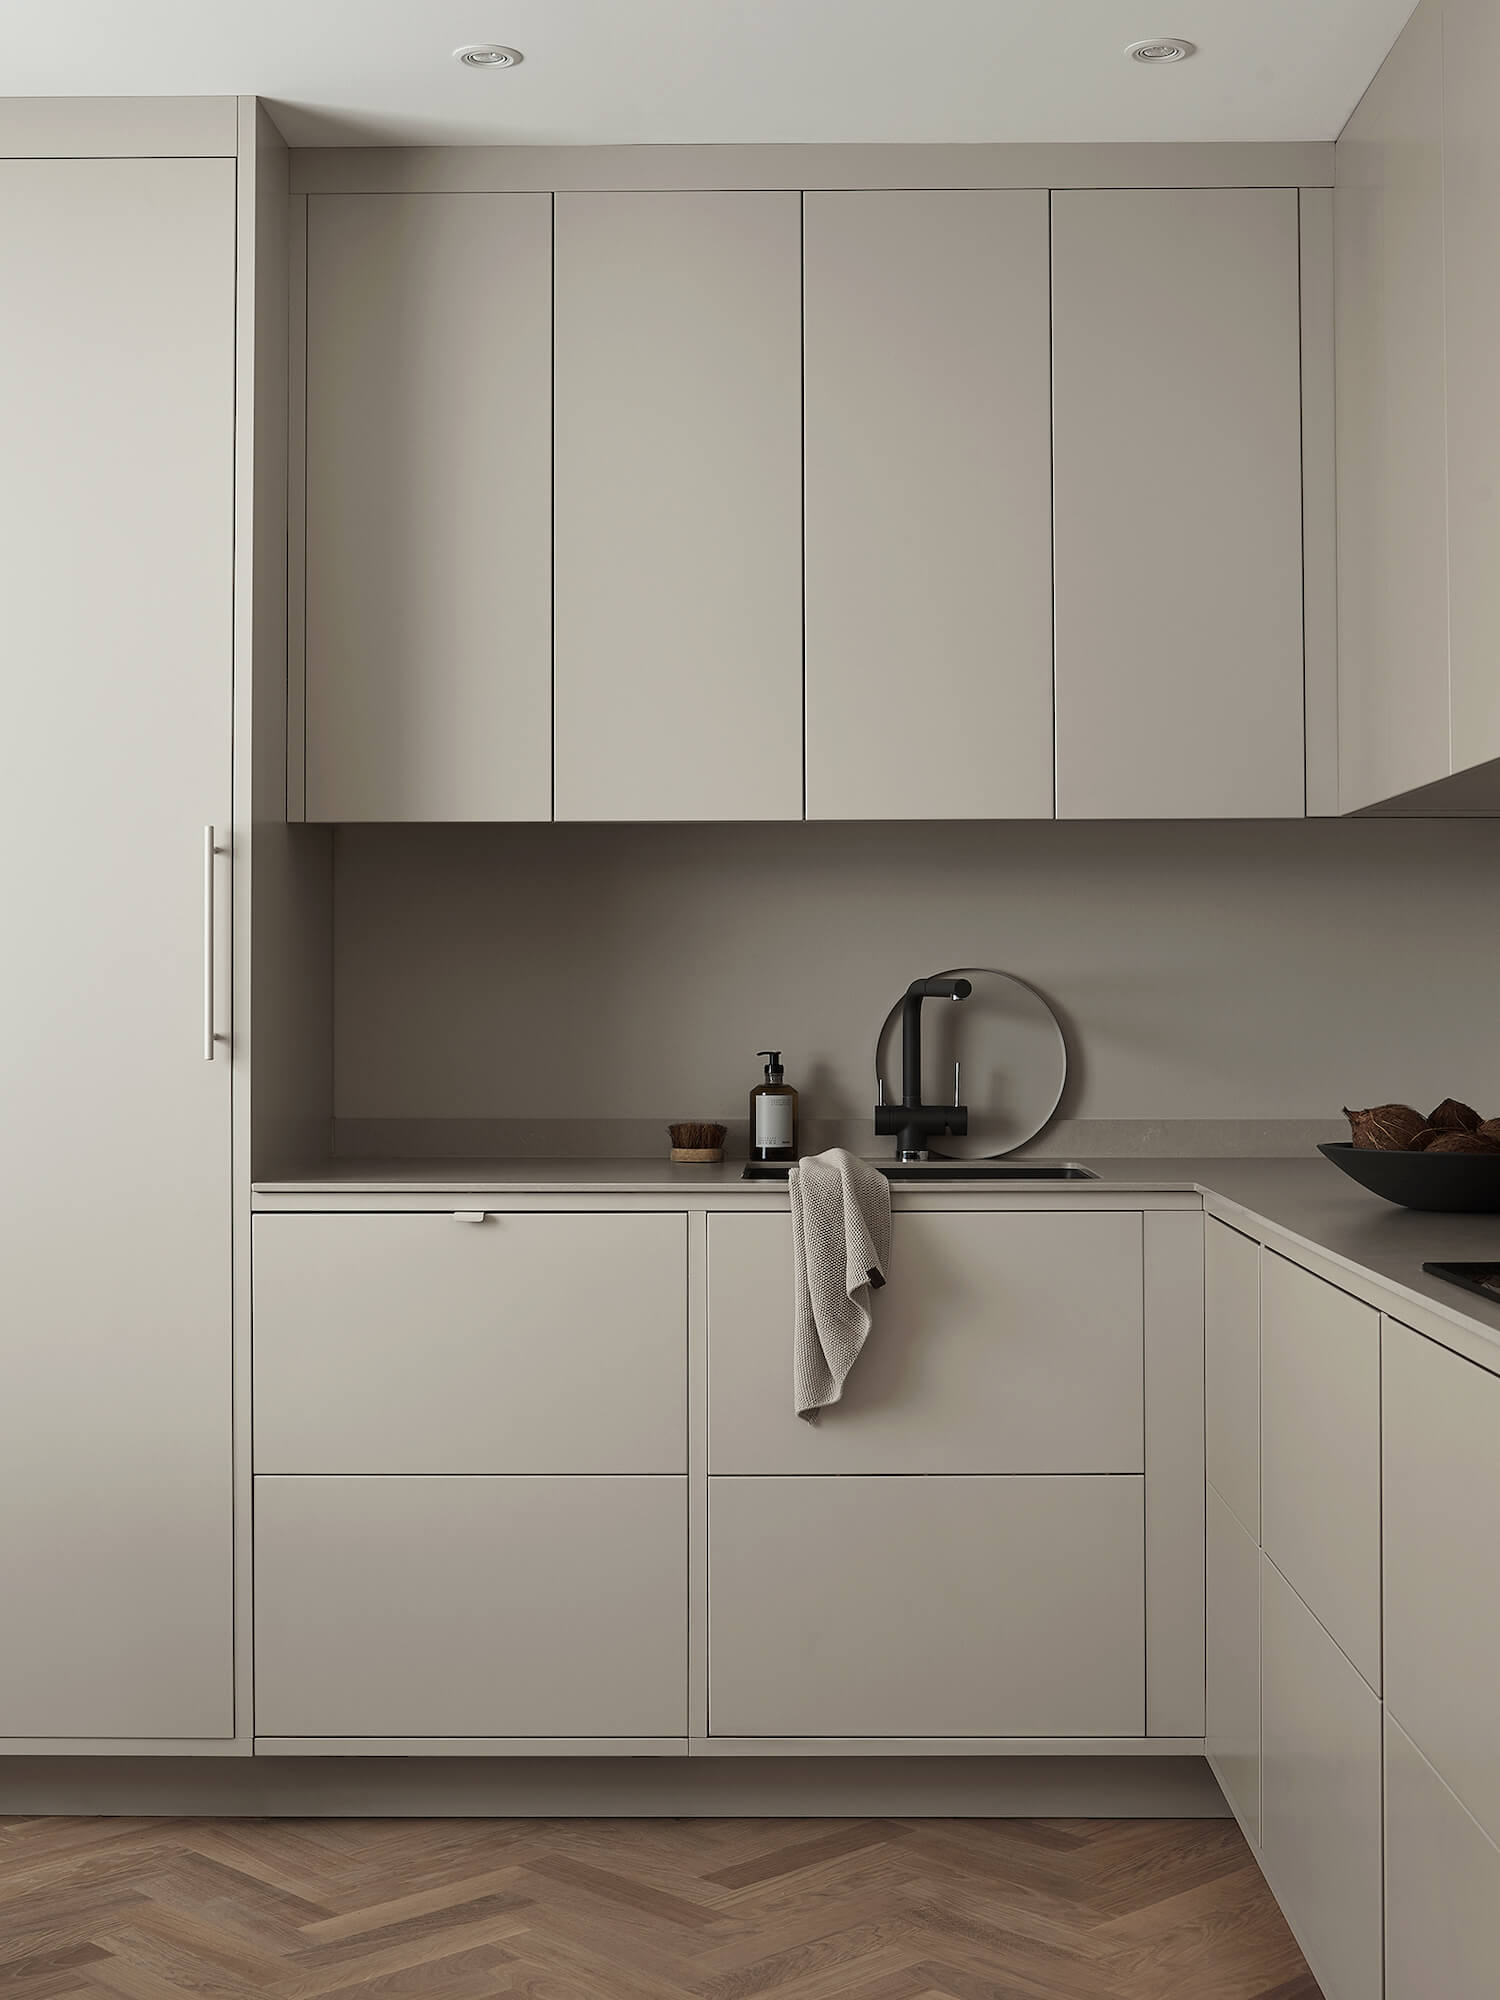 Grey Minimalist Kitchen by Nordiska Kok | Designing a Nordic-Style Kitchen